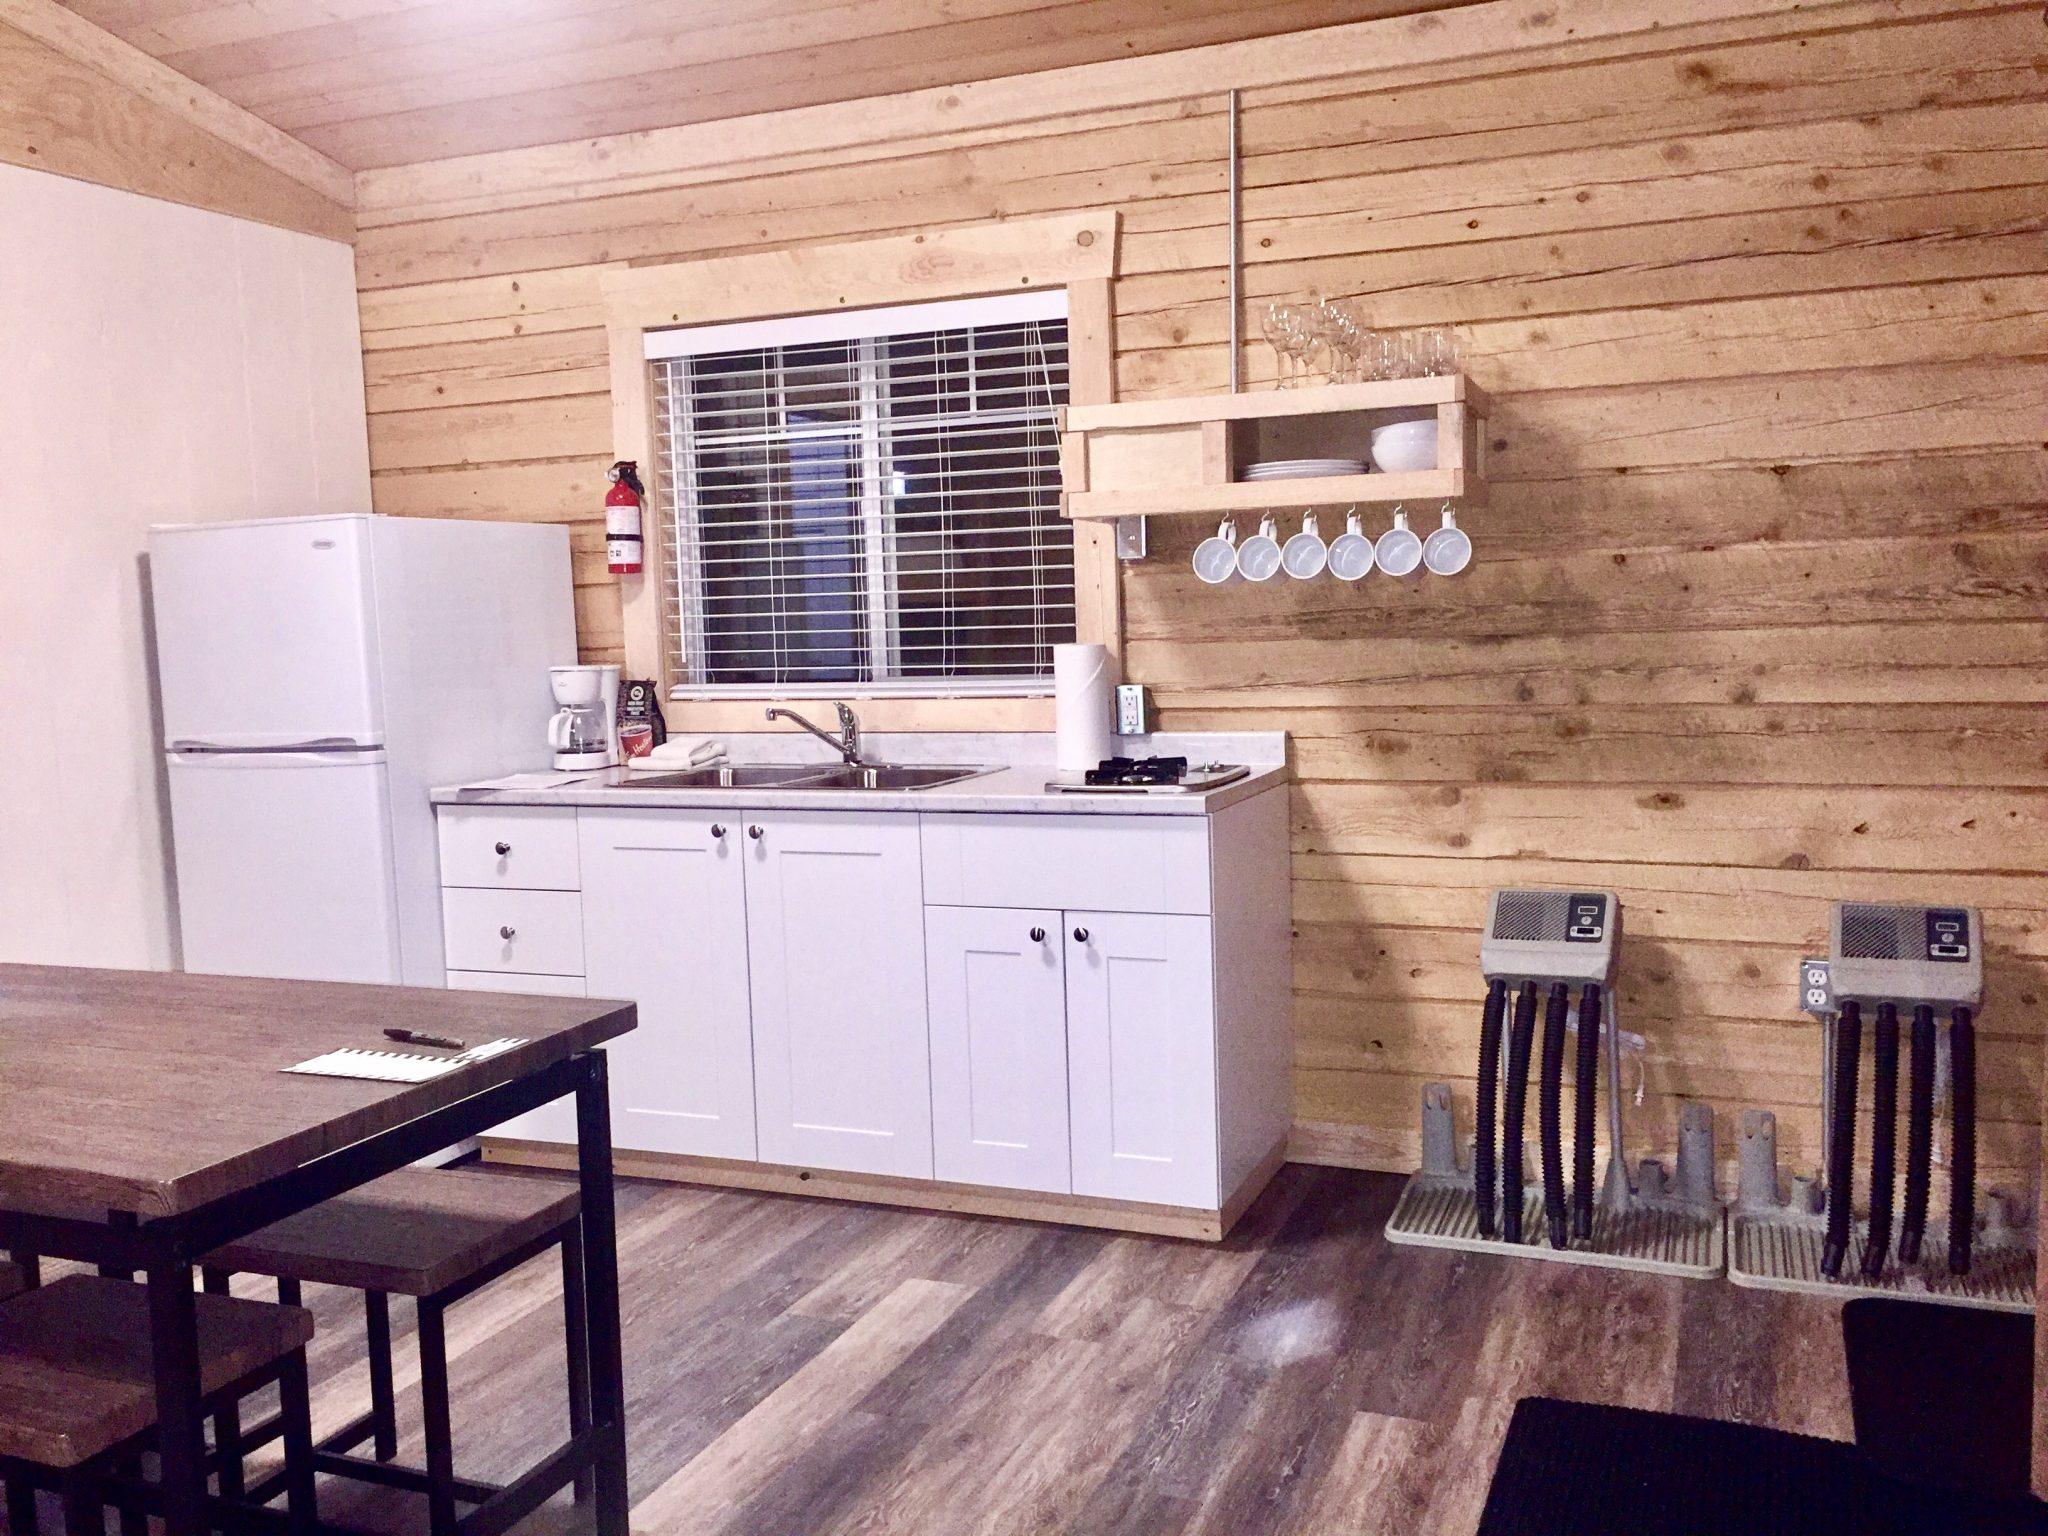 Vacation Rental Revelstoke Base Camp Stay